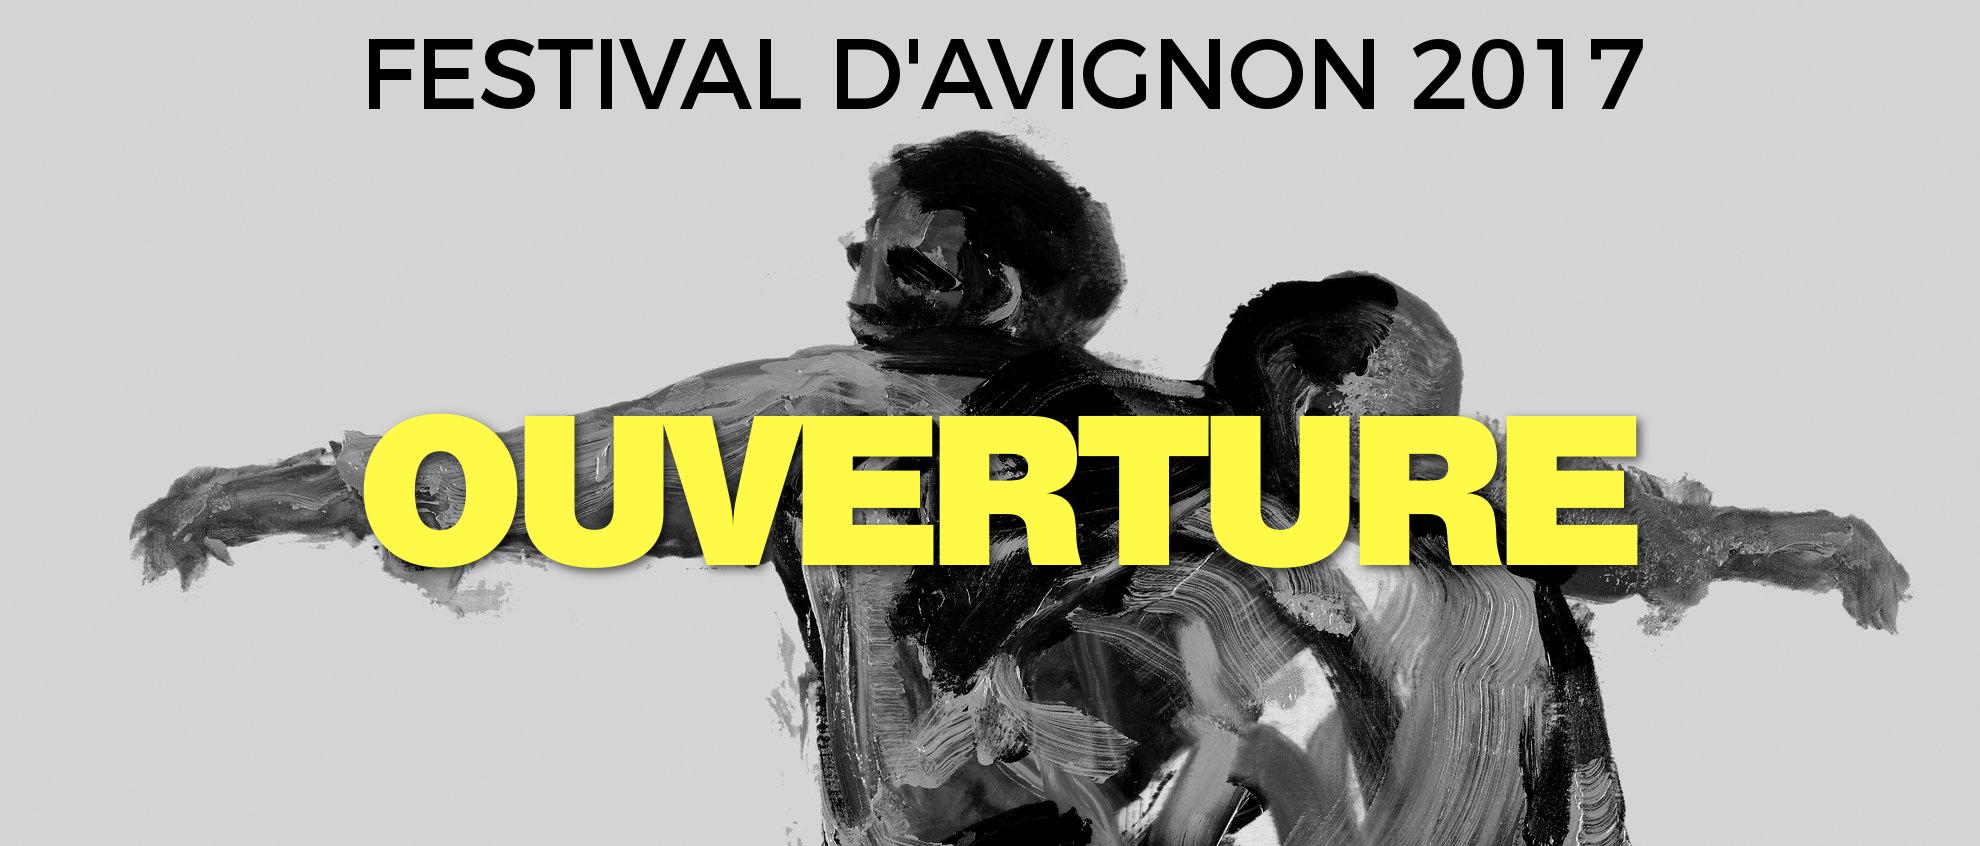 Ouverture du festival d 39 avignon 2017 festival avignon for Ouverture castorama avignon